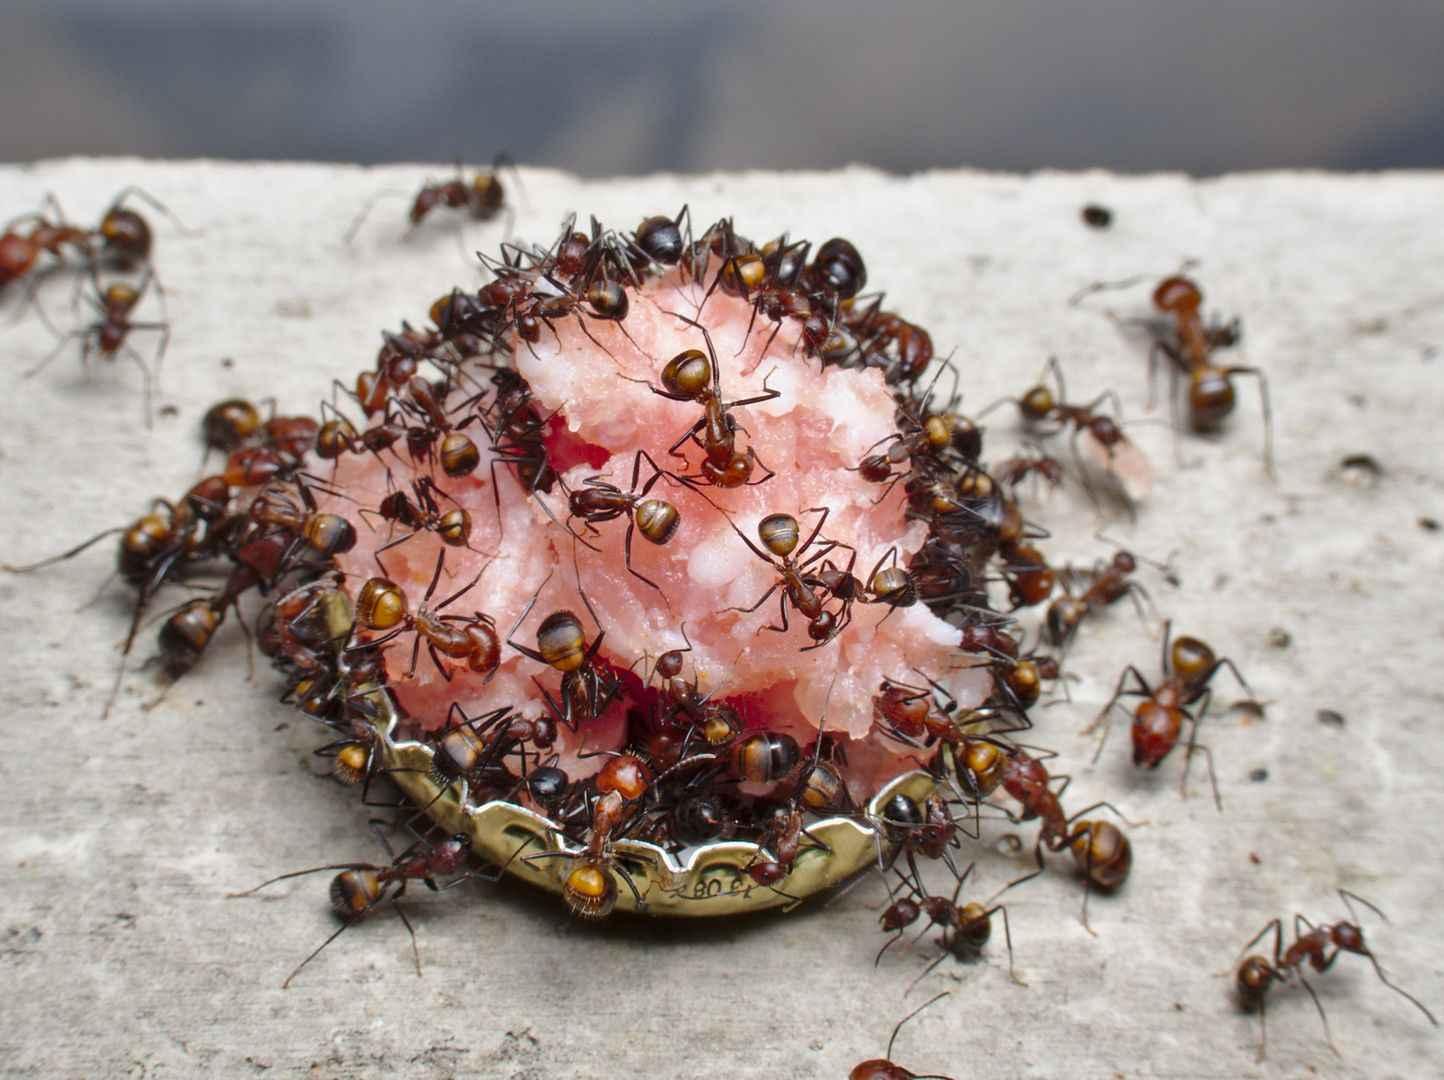 Camponotus nicobarensis: Zwiebelmettwurst